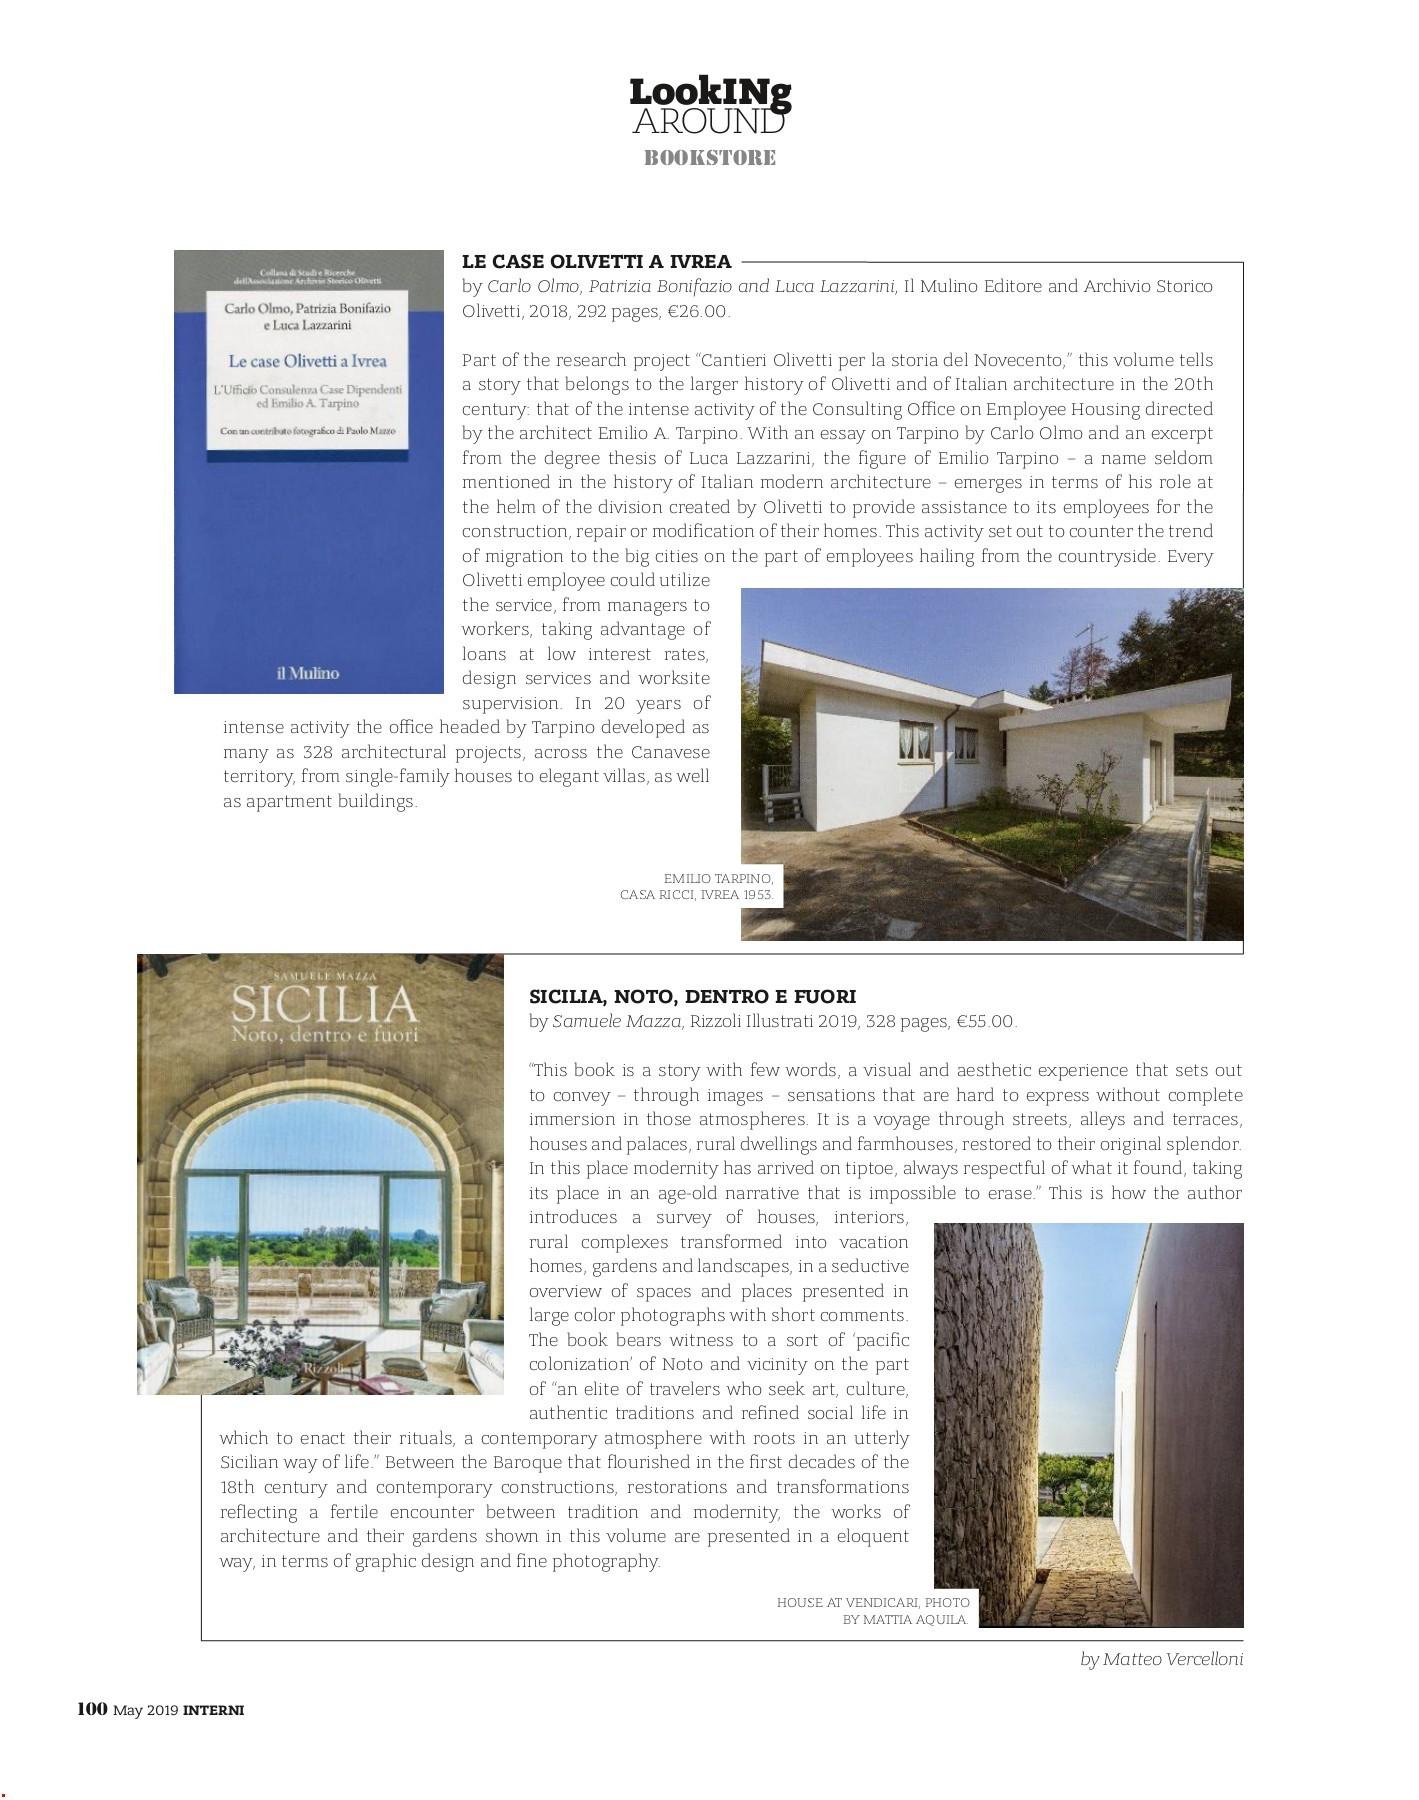 Candelabri Maison Du Monde interni_italia__maggio_2019-flip book pages 101-150   pubhtml5